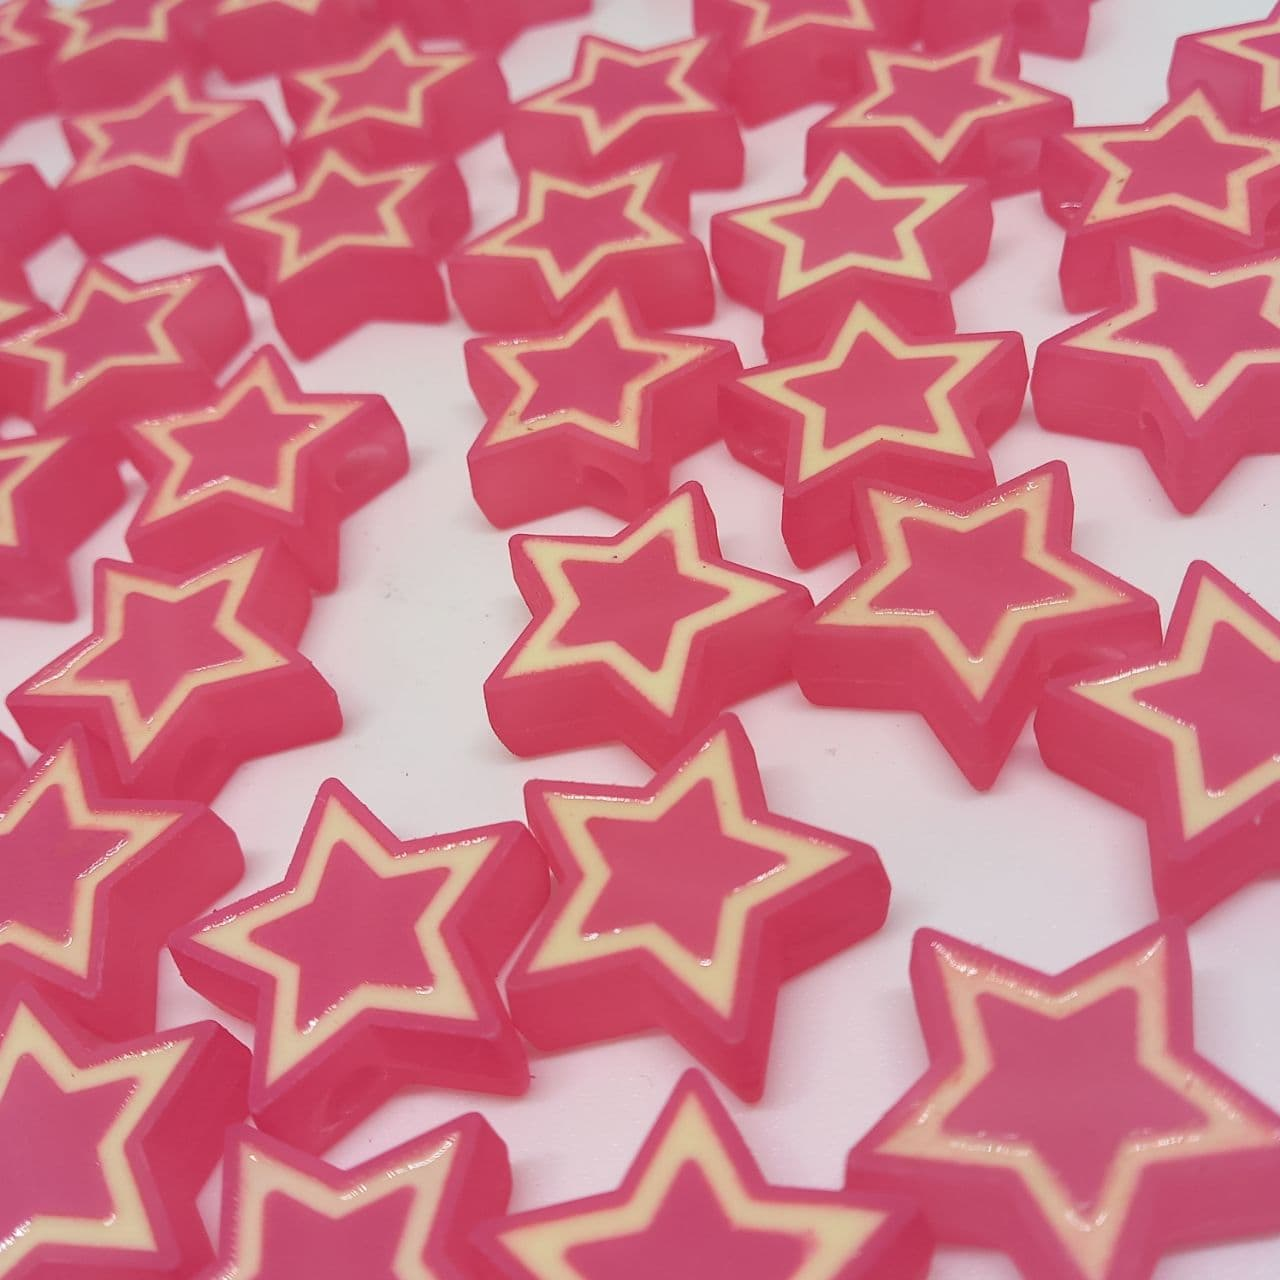 Estrela c/ furo passante rosa 23 mm- unidade